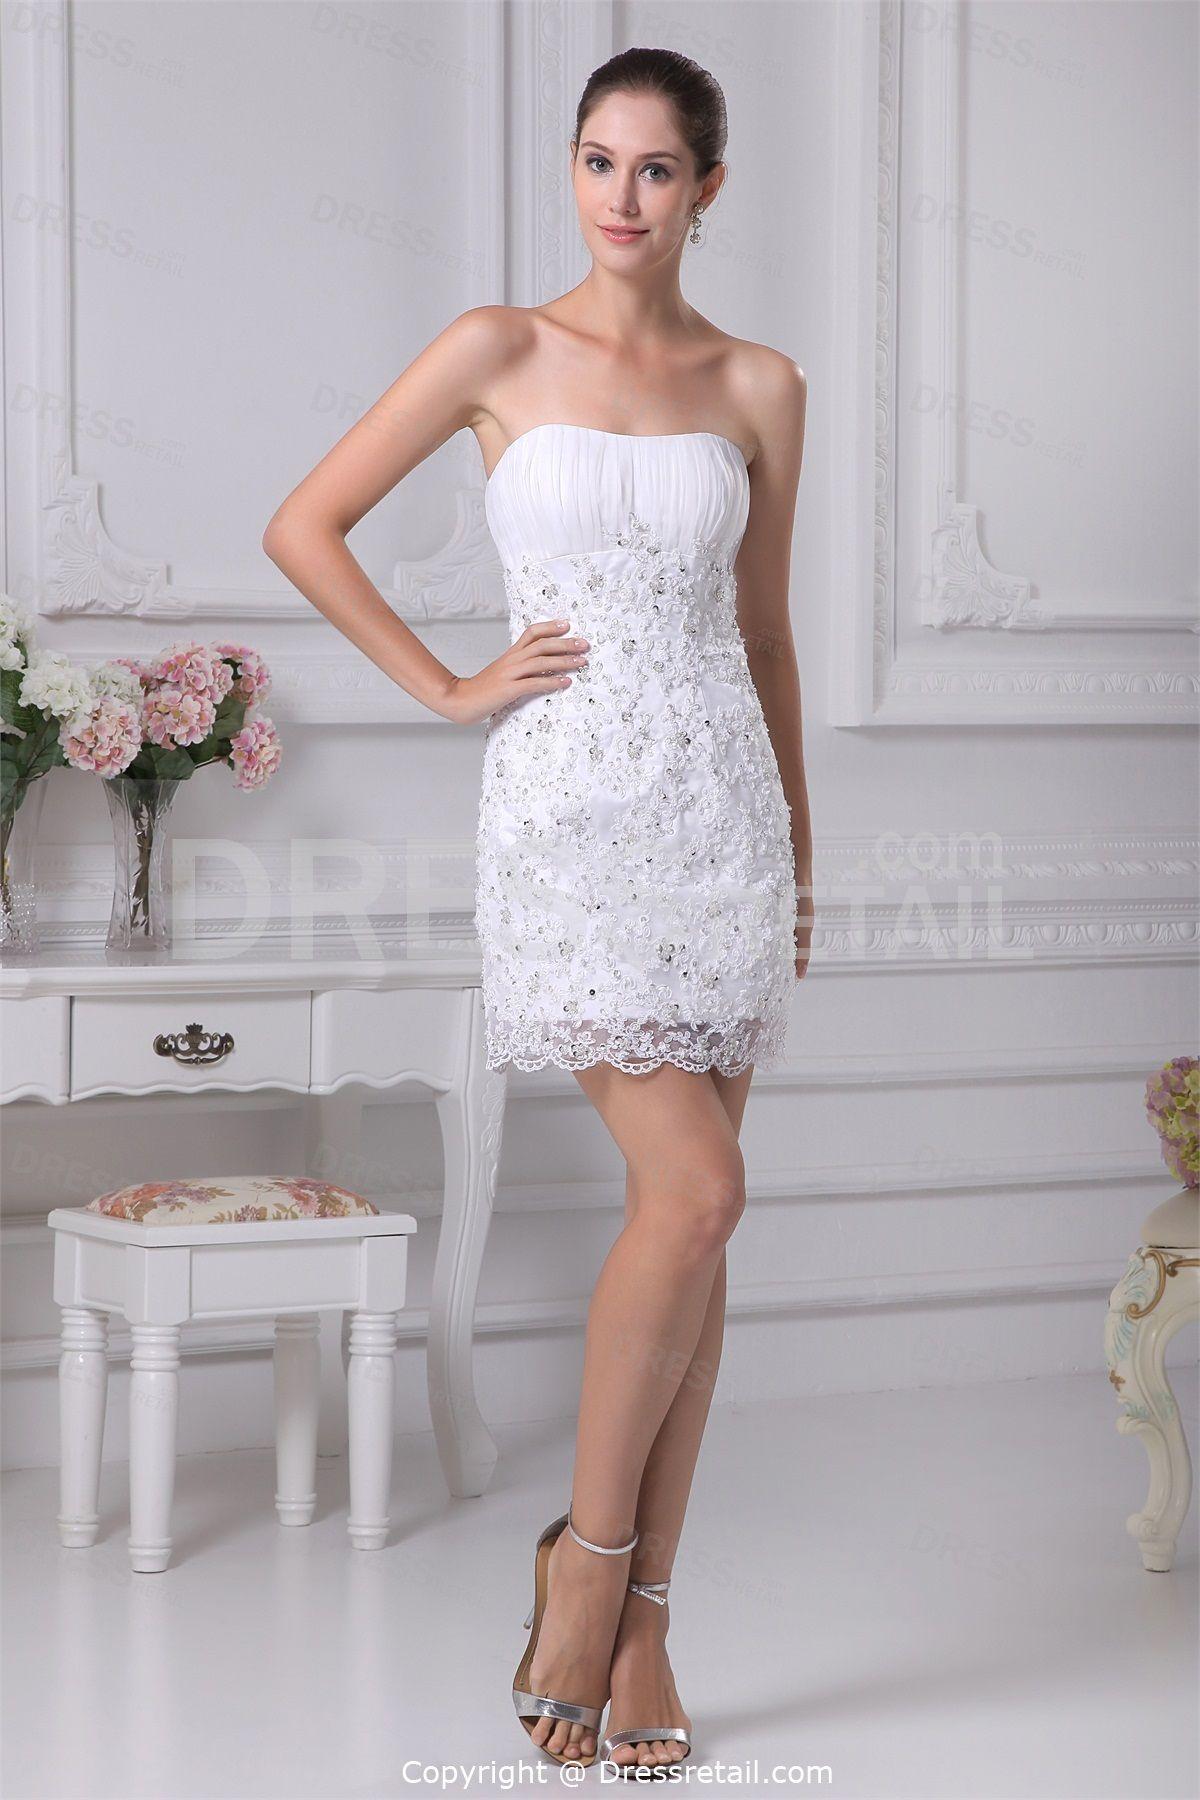 White Lace Short Sheath Column Natural Strapless Summer Wedding Dress